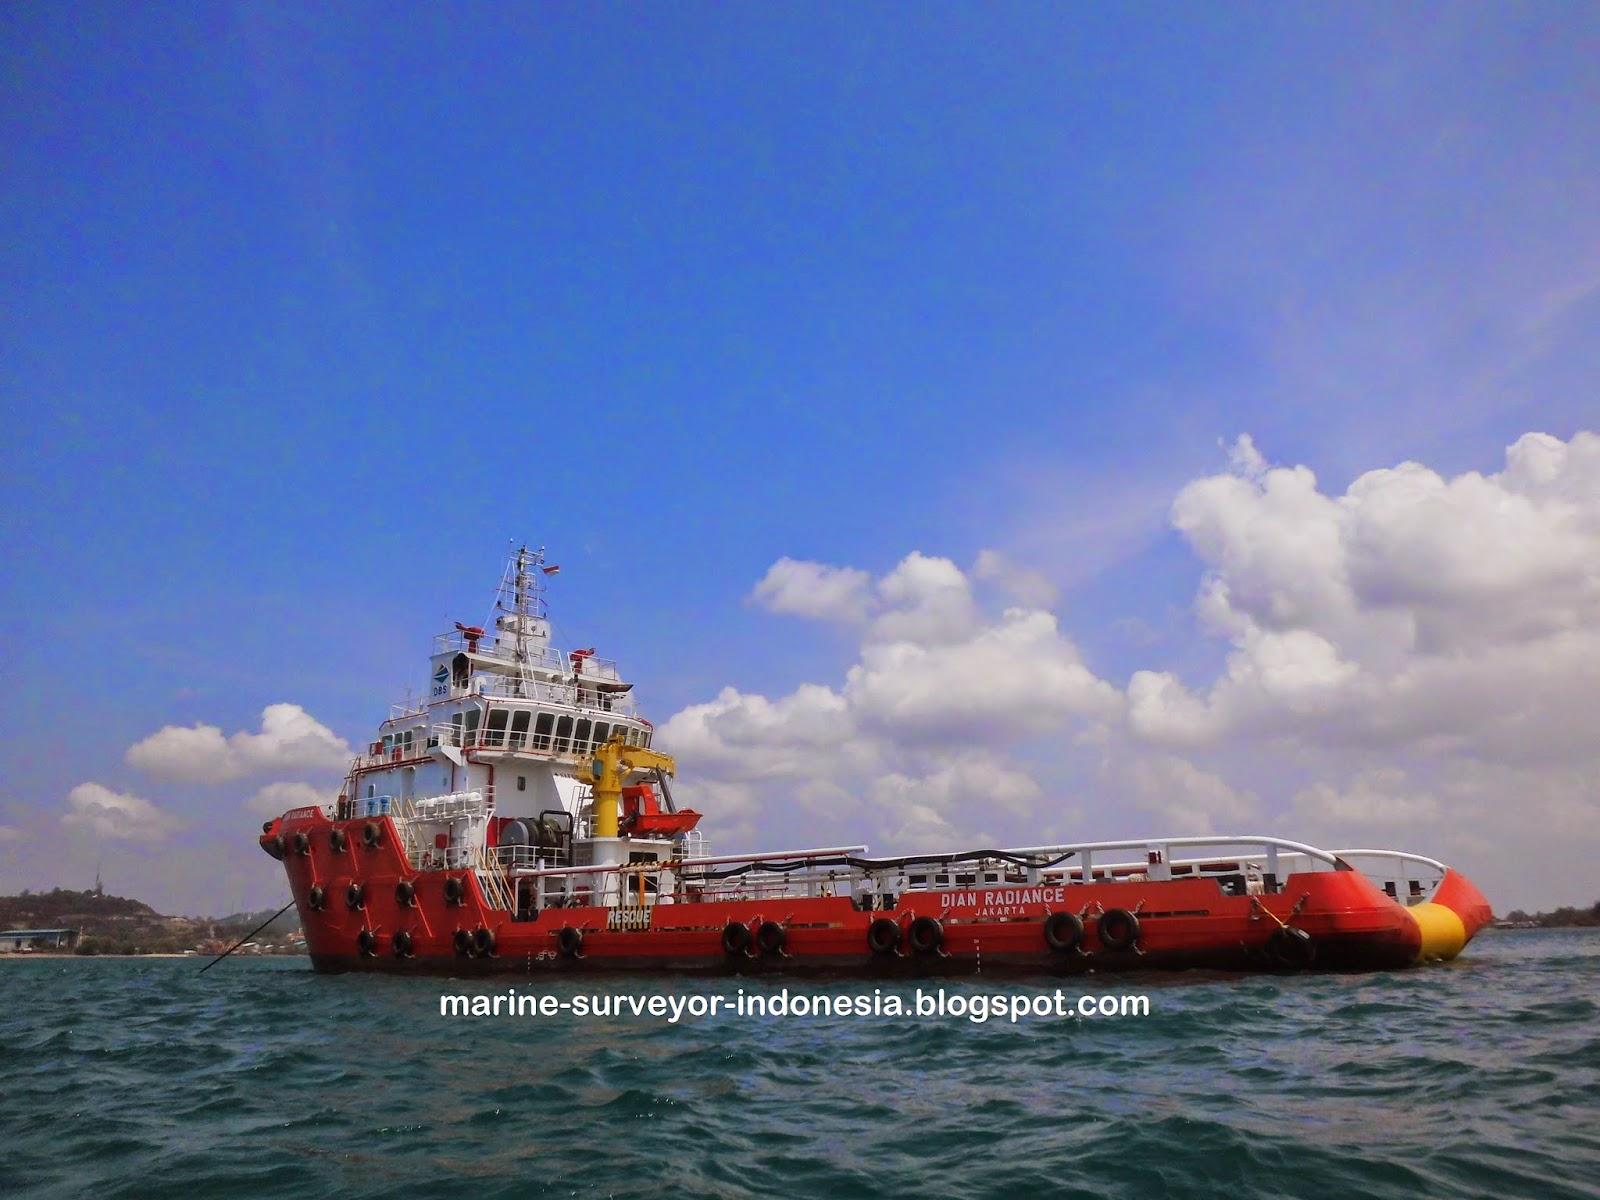 Suitability Survey Kapal AHTS. Dian Radiance Di Sekupang, Batam